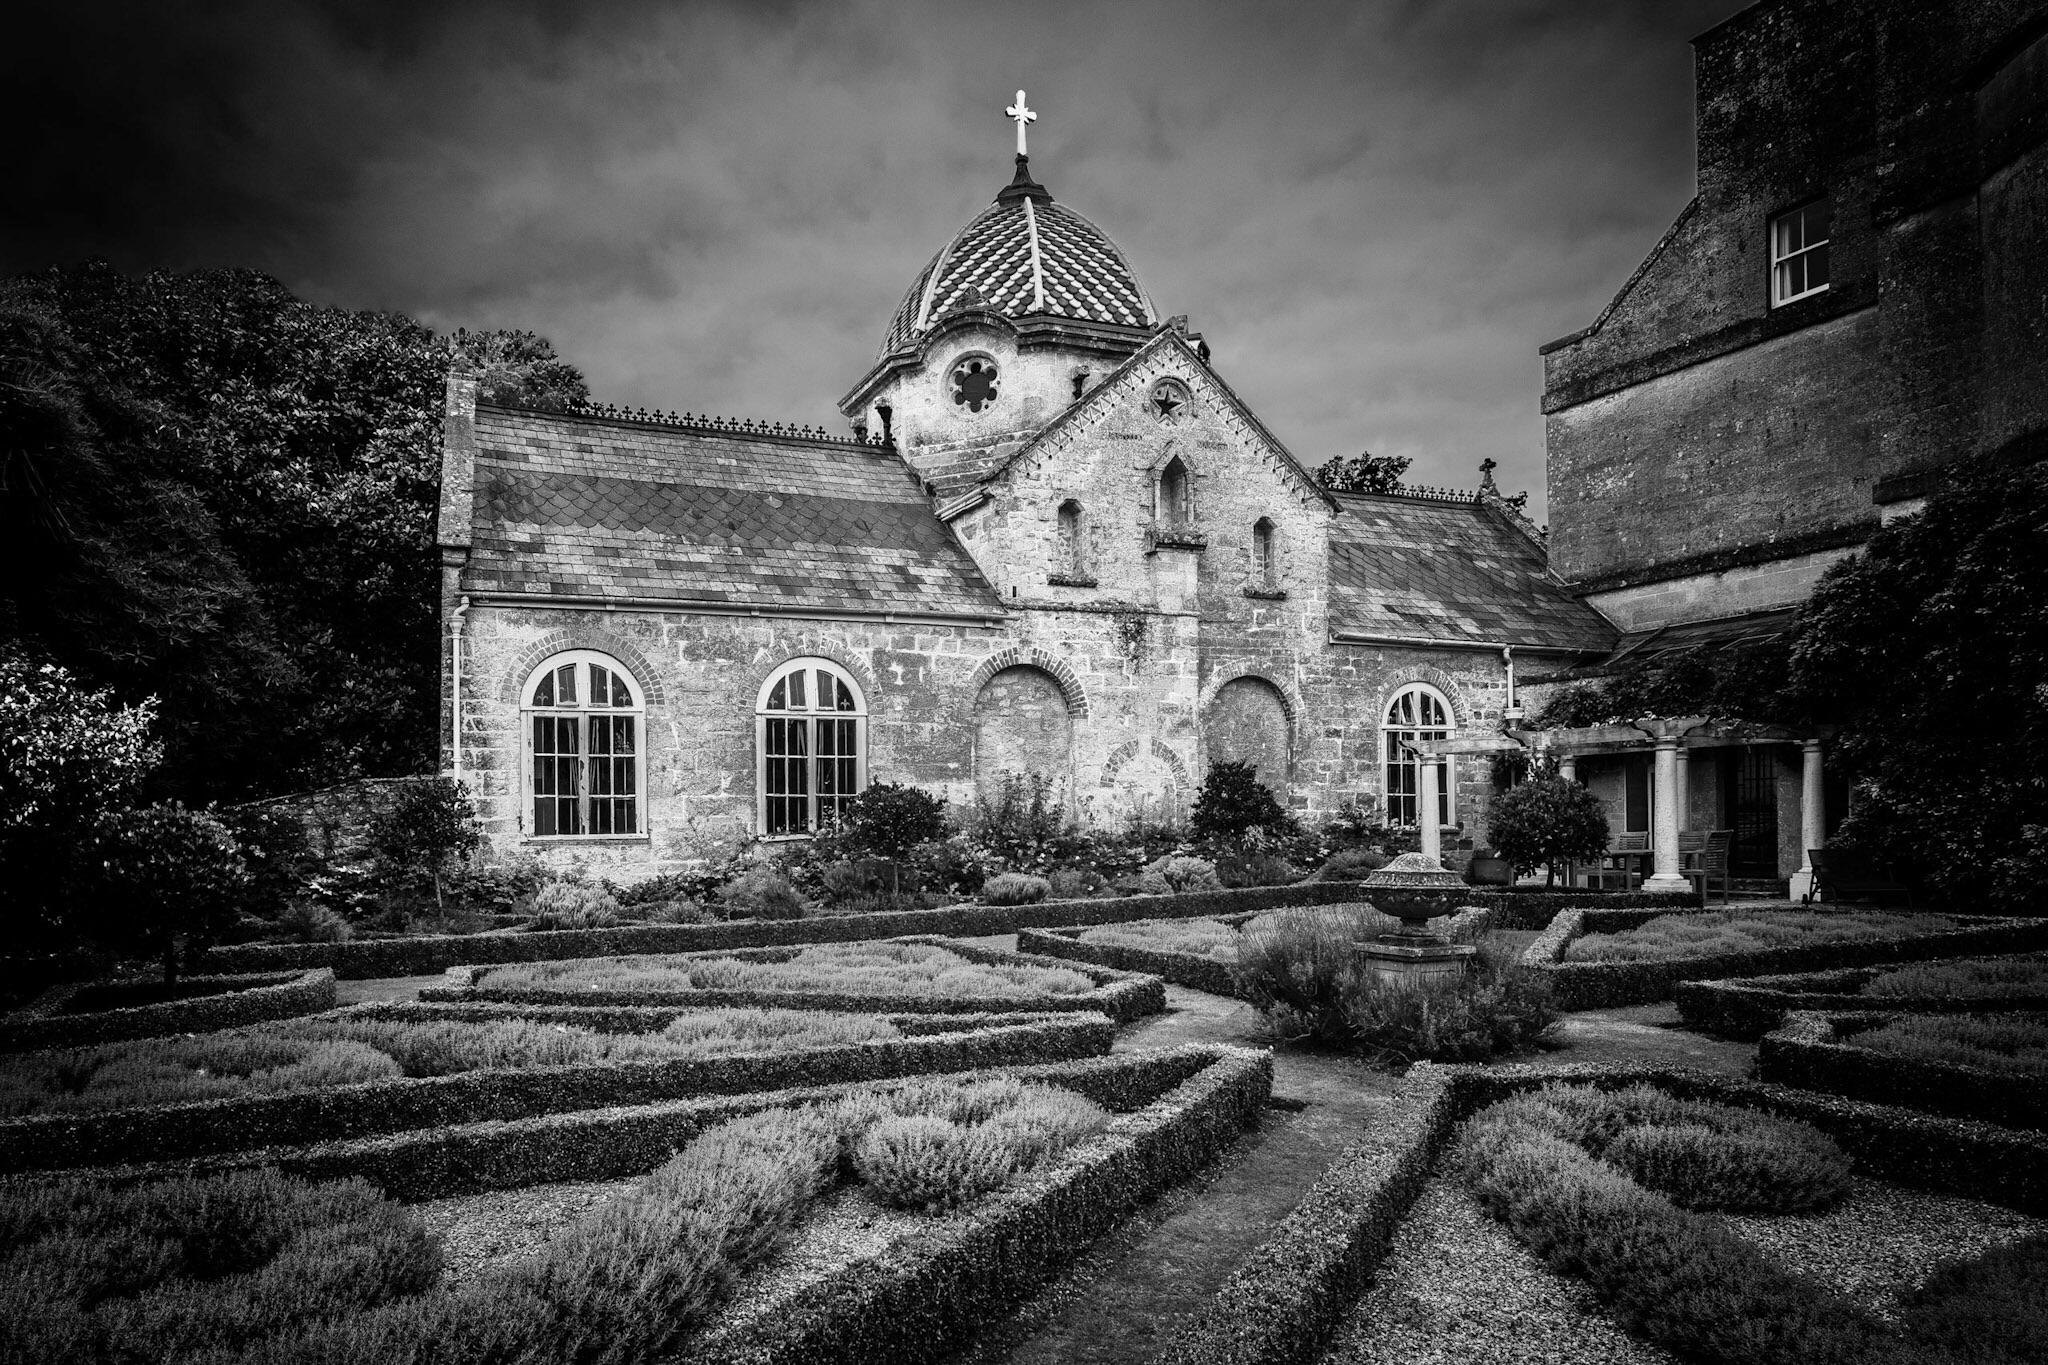 Chideock Church - the re-edit